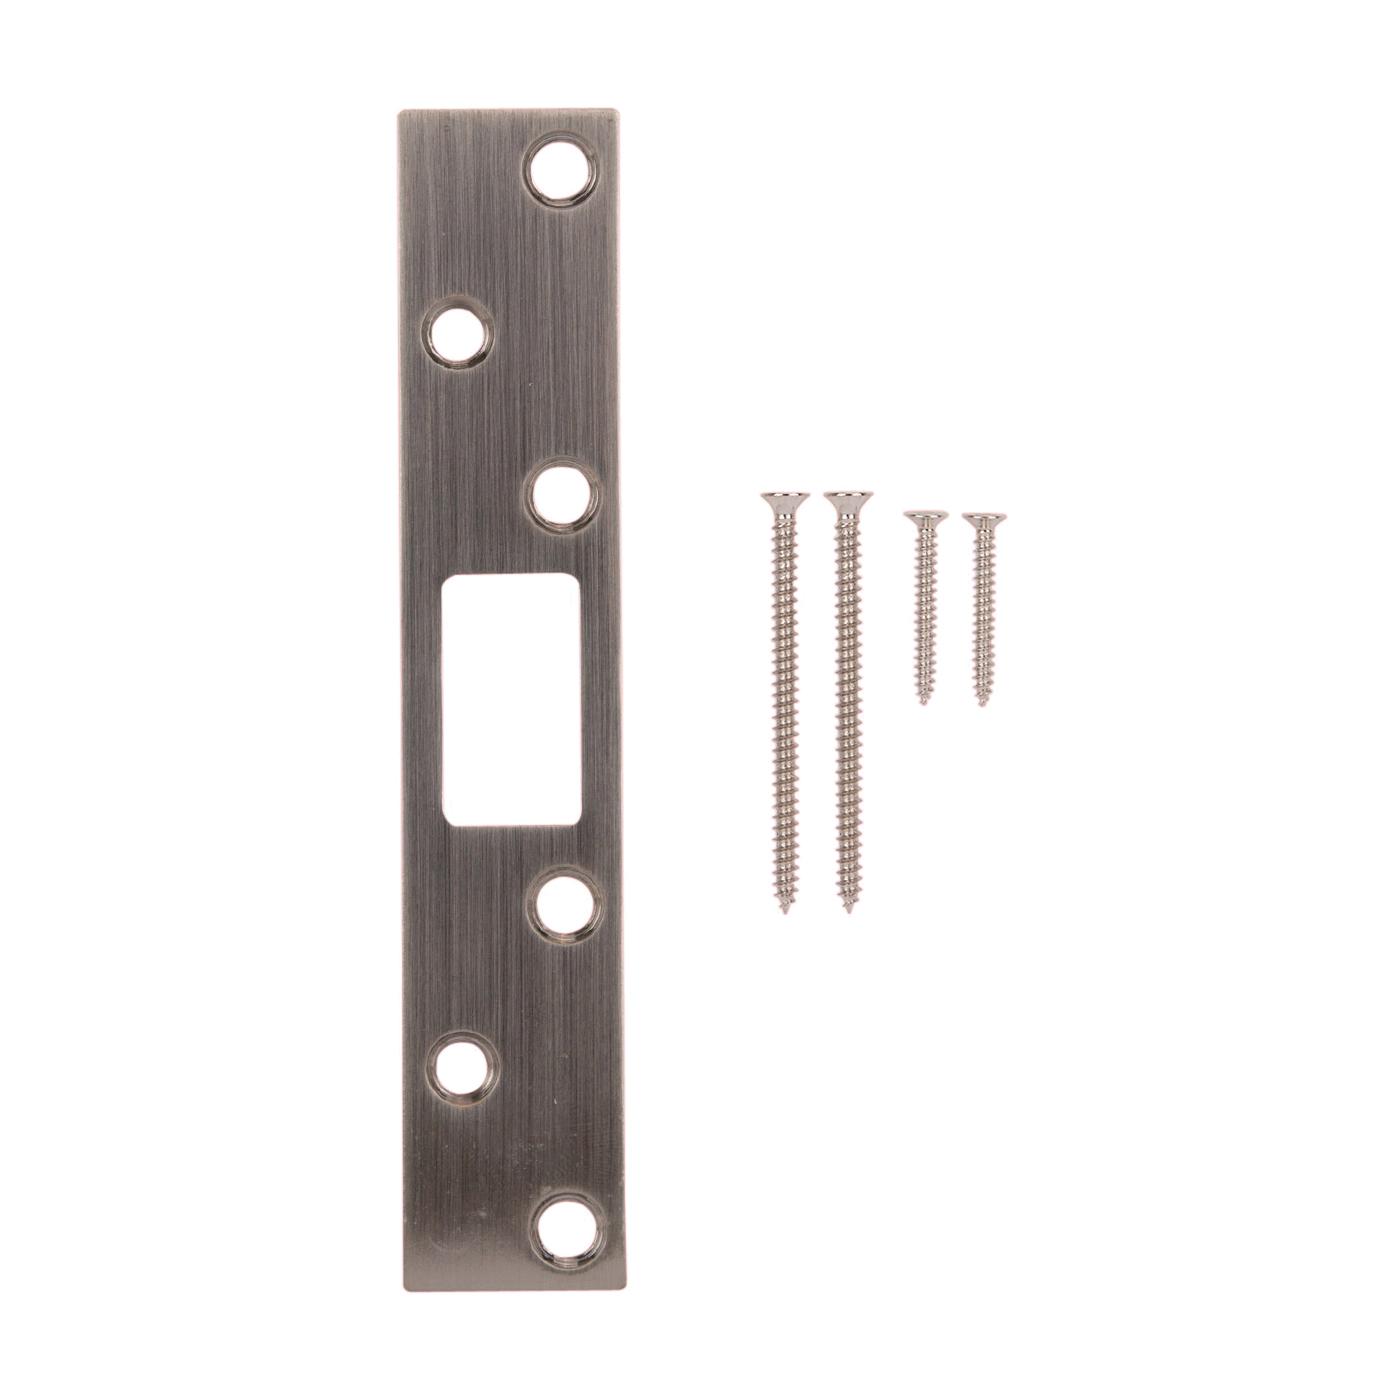 Picture of ProSource HSH-004BN-PS Security Door Latch Strike, Steel, Satin Nickel, 6 in H, 1-1/8 in W